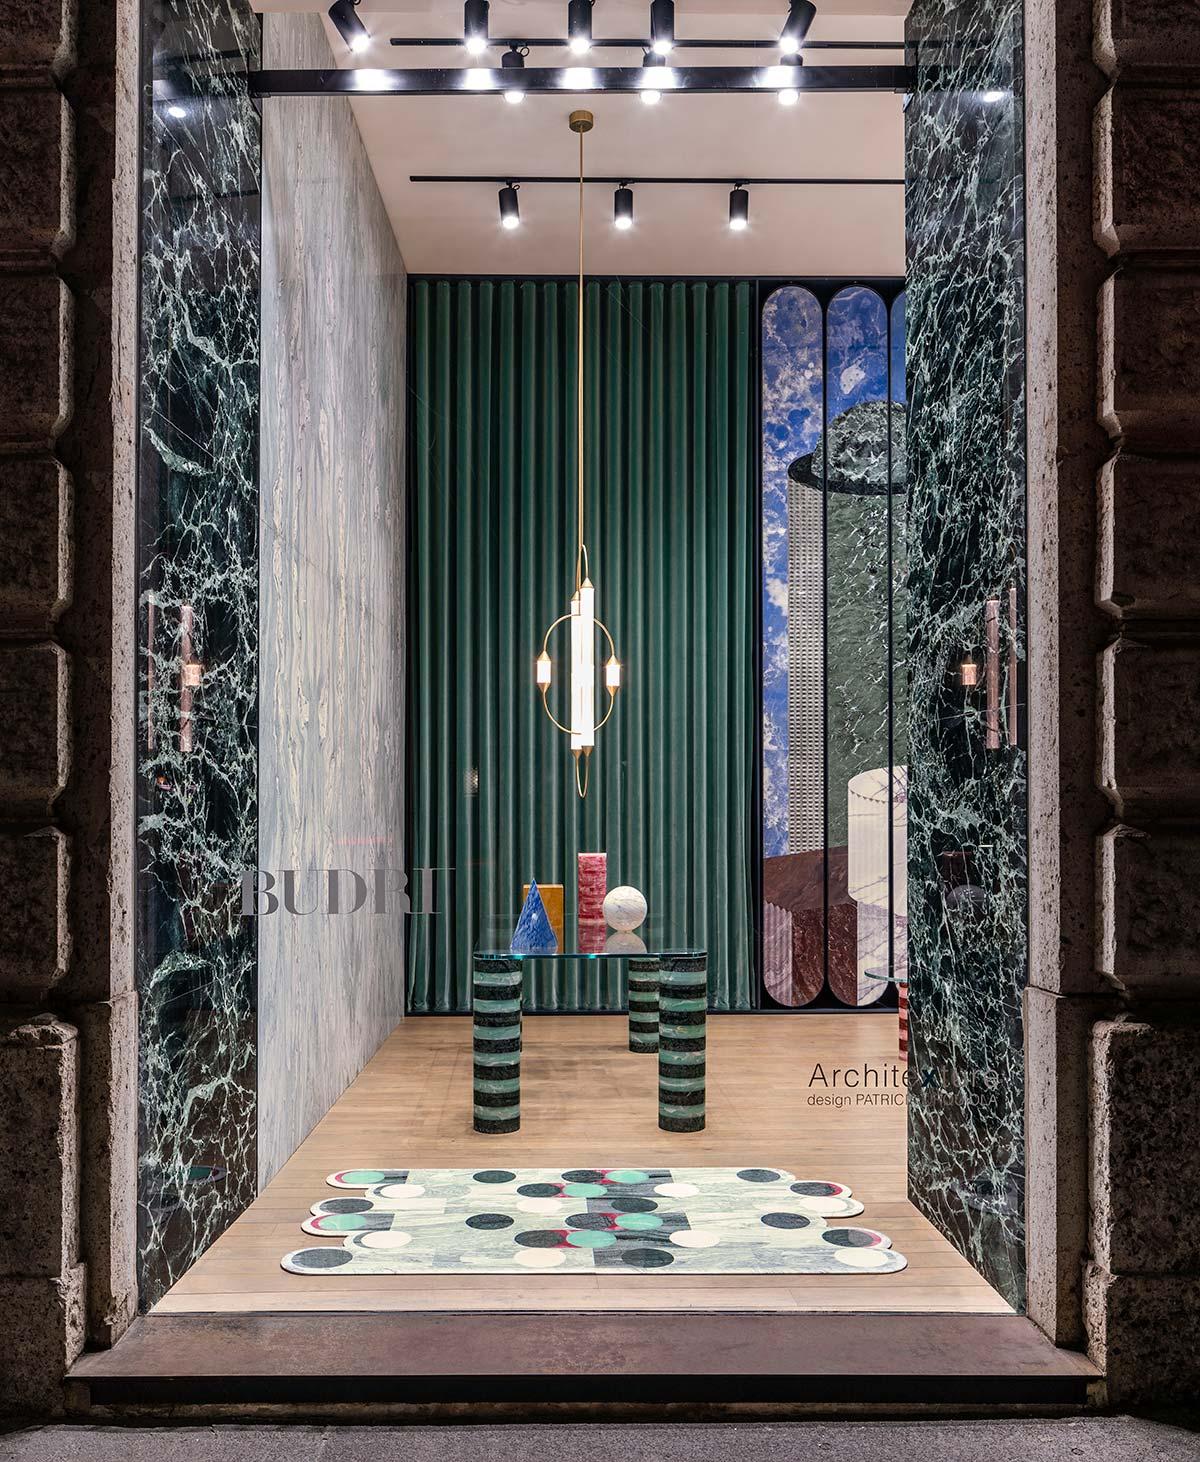 Architexture Collection by Budri, Design Patricia Urquiola